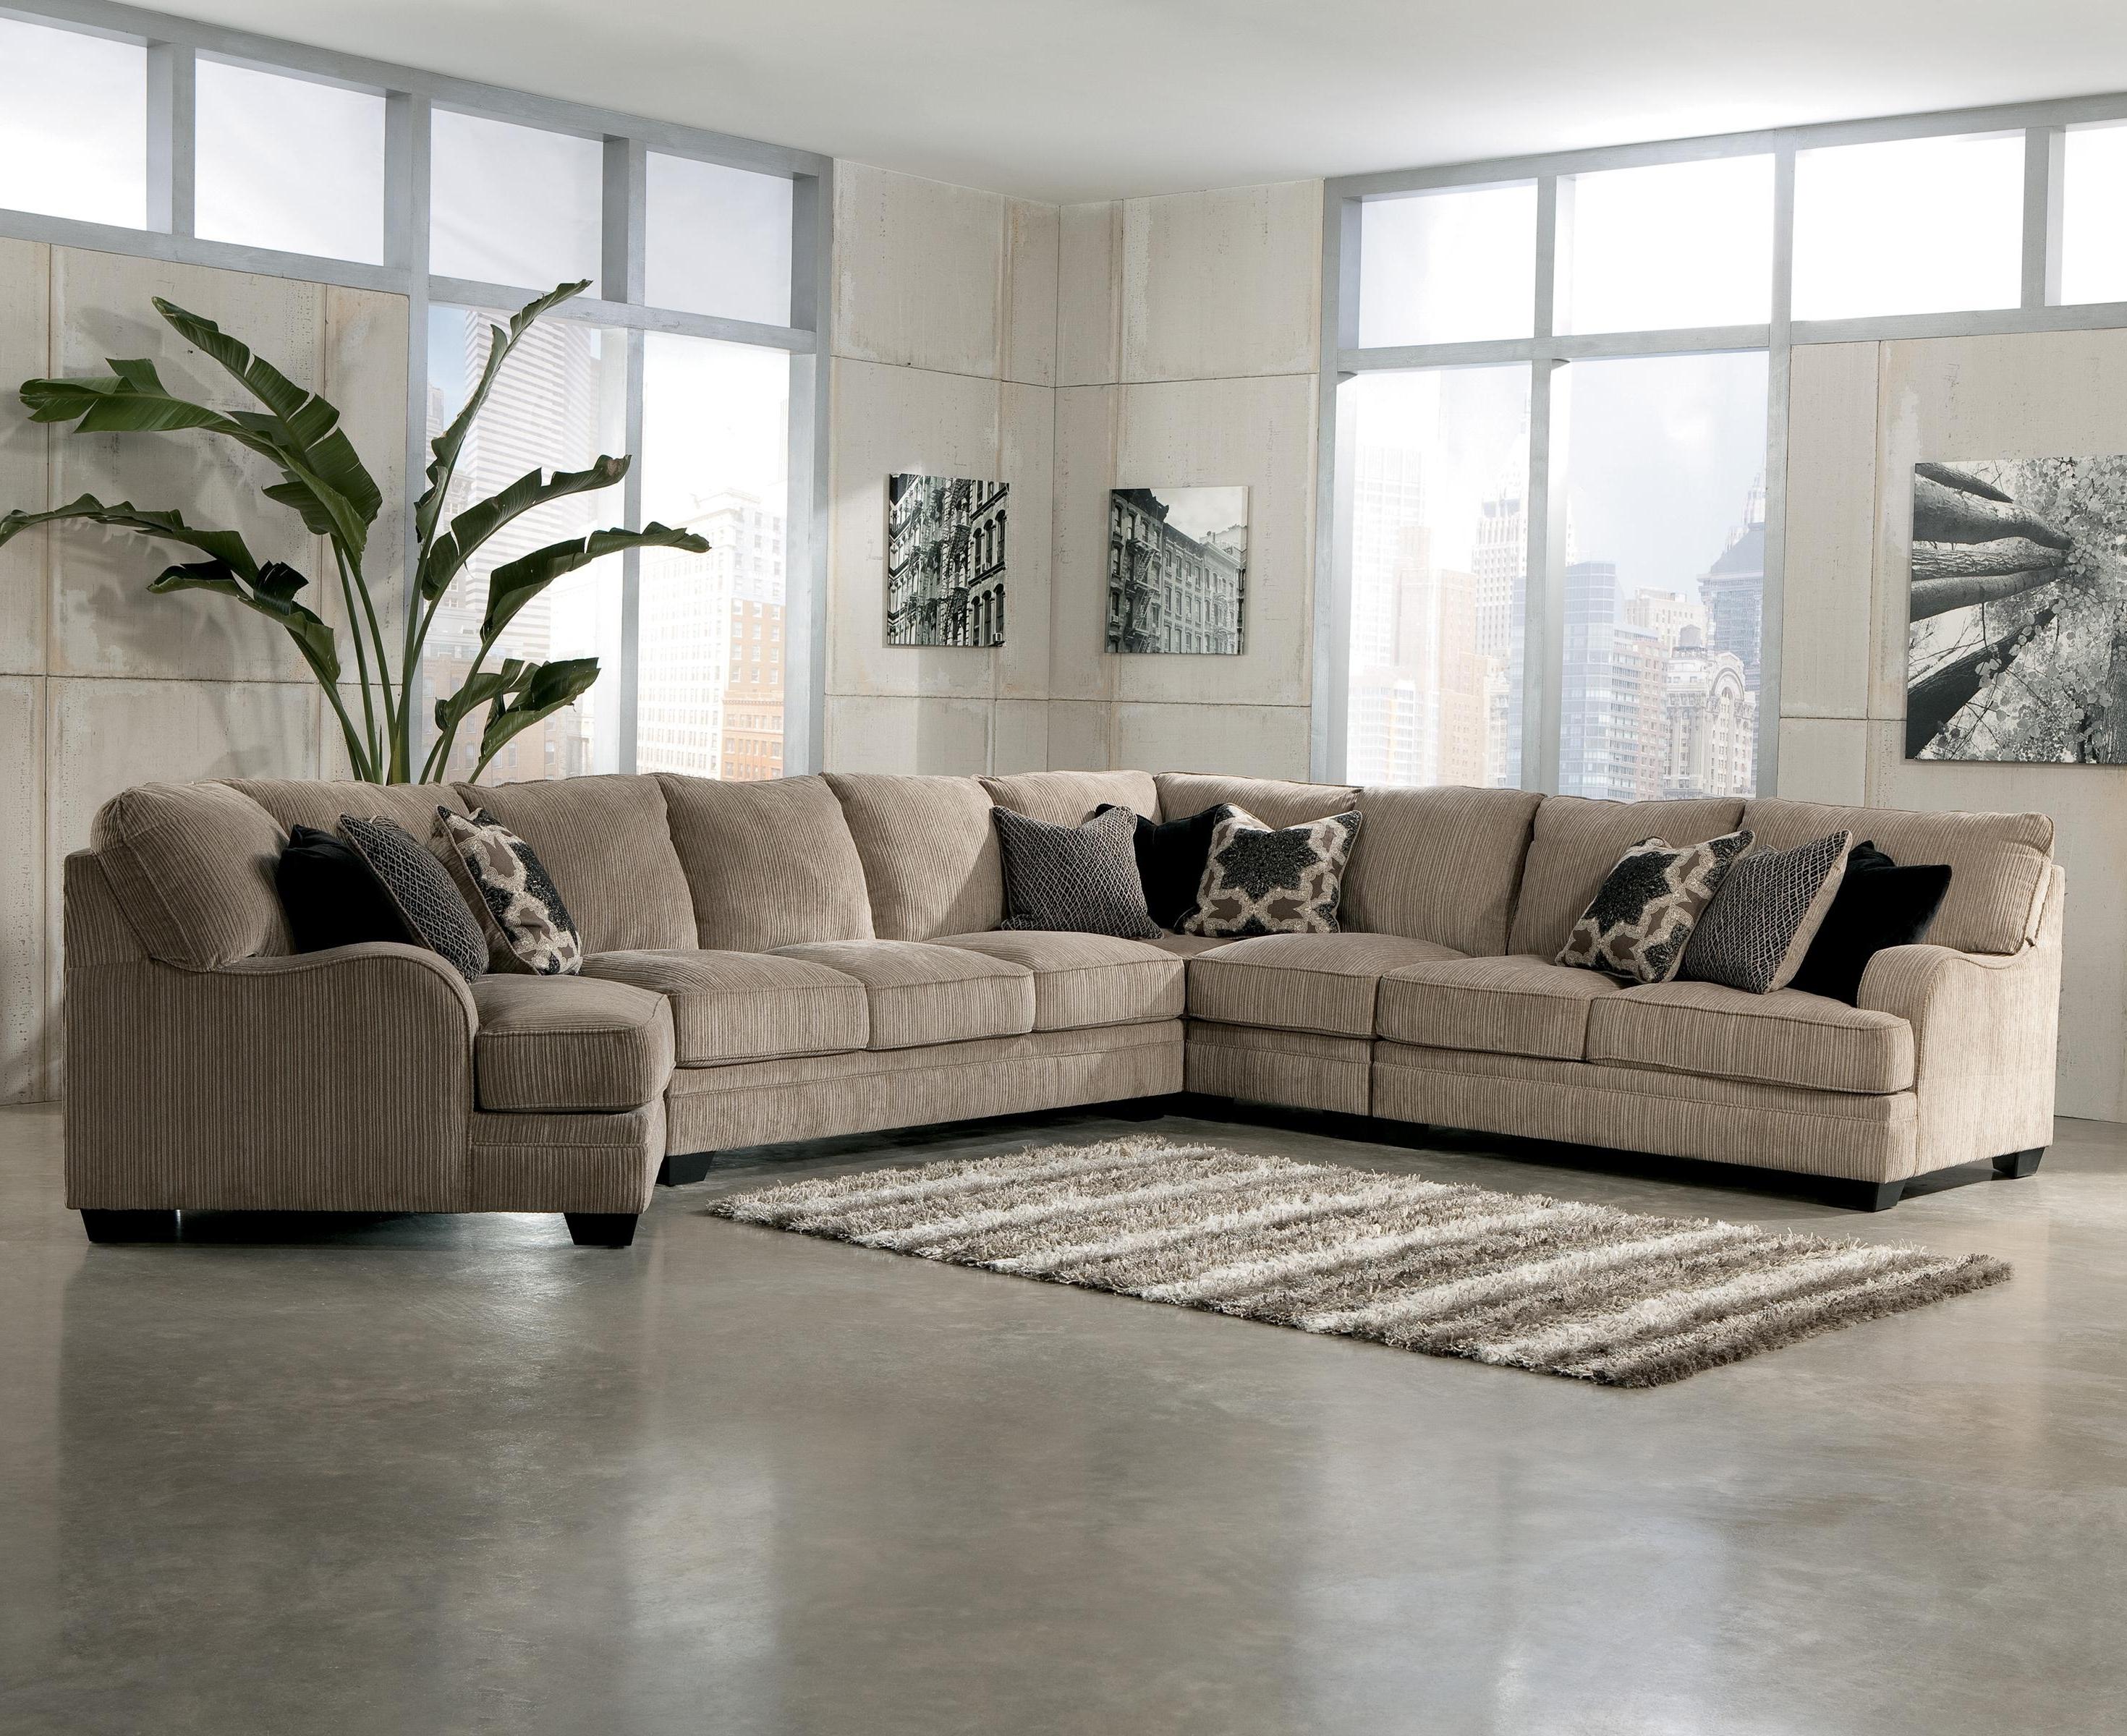 Famous Home Furniture Sectional Sofas Inside Signature Designashley Katisha – Platinum 5 Piece Sectional (View 7 of 20)